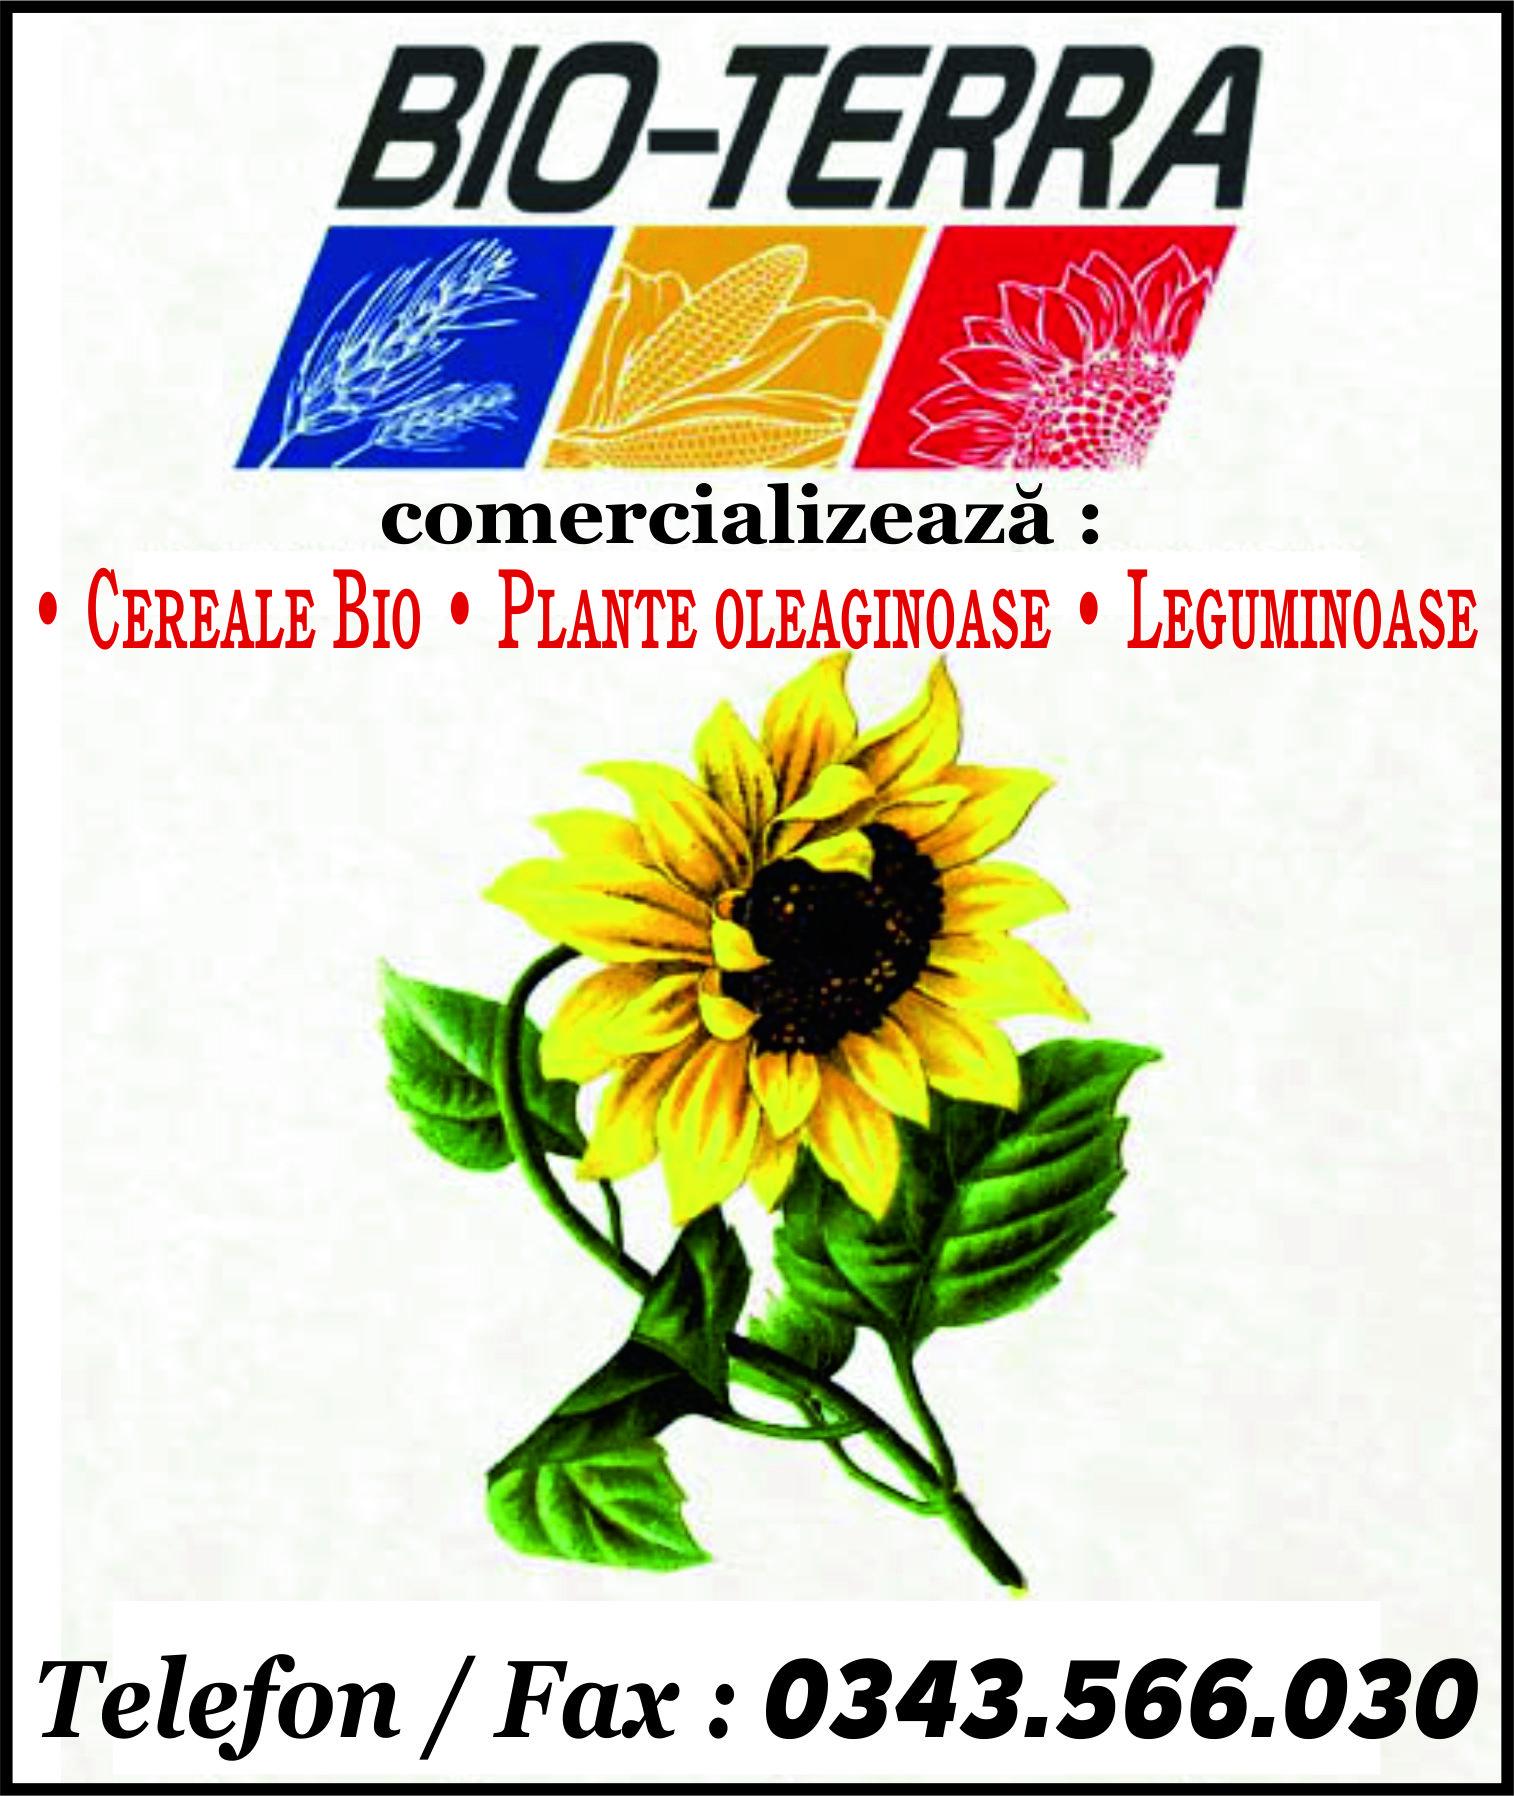 bioterra.jpg